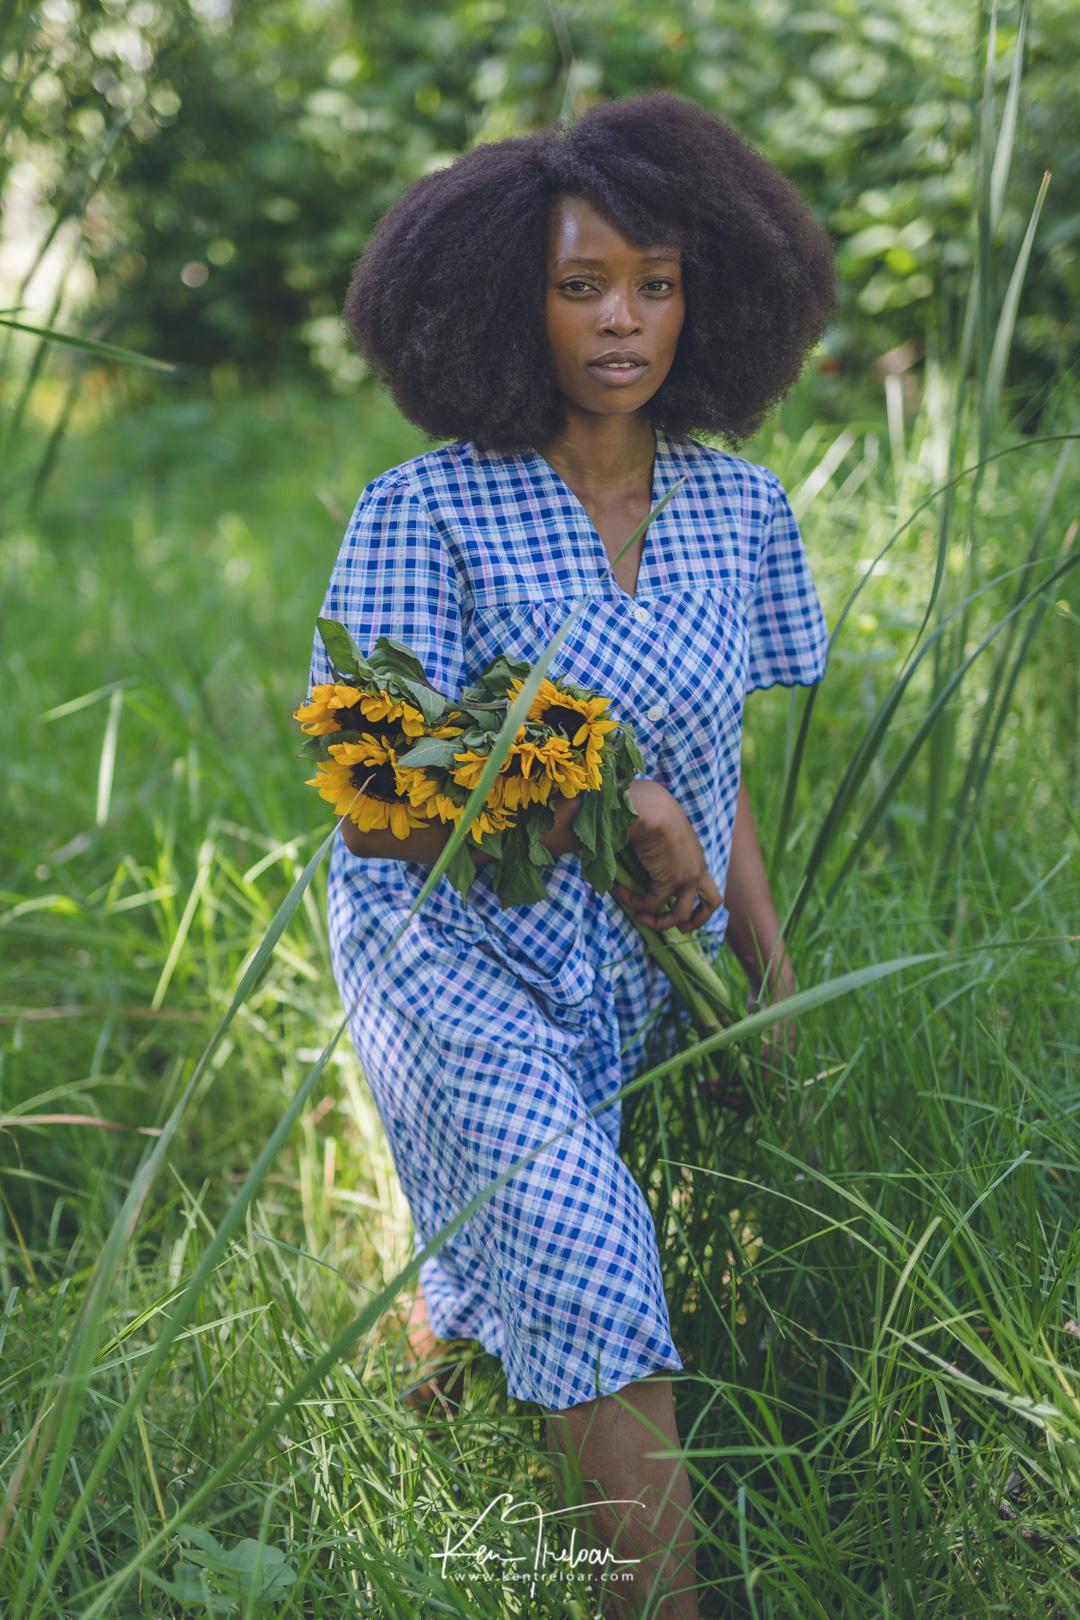 Ken Treloar Photography - Natural L-ight Editorial Portrait Fashion Photo Session - Cape Town Dec 2018-34.jpg